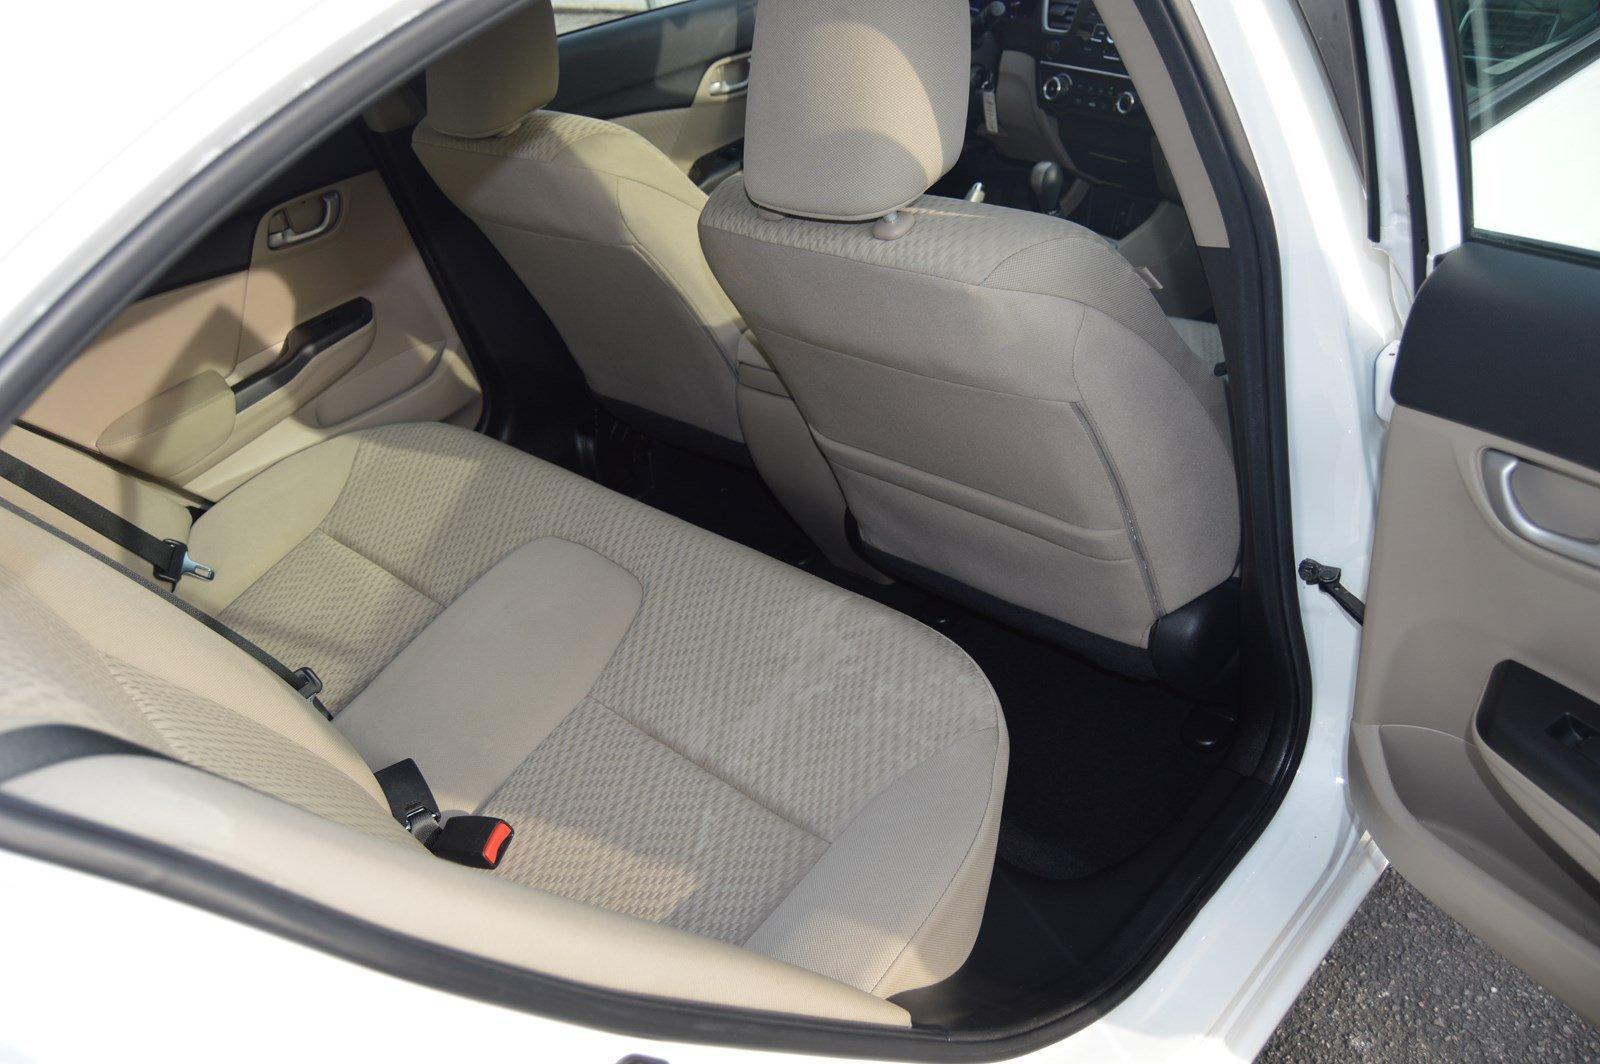 Used-2015-Honda-Civic-Sedan-LX-(Manual-Transmission)